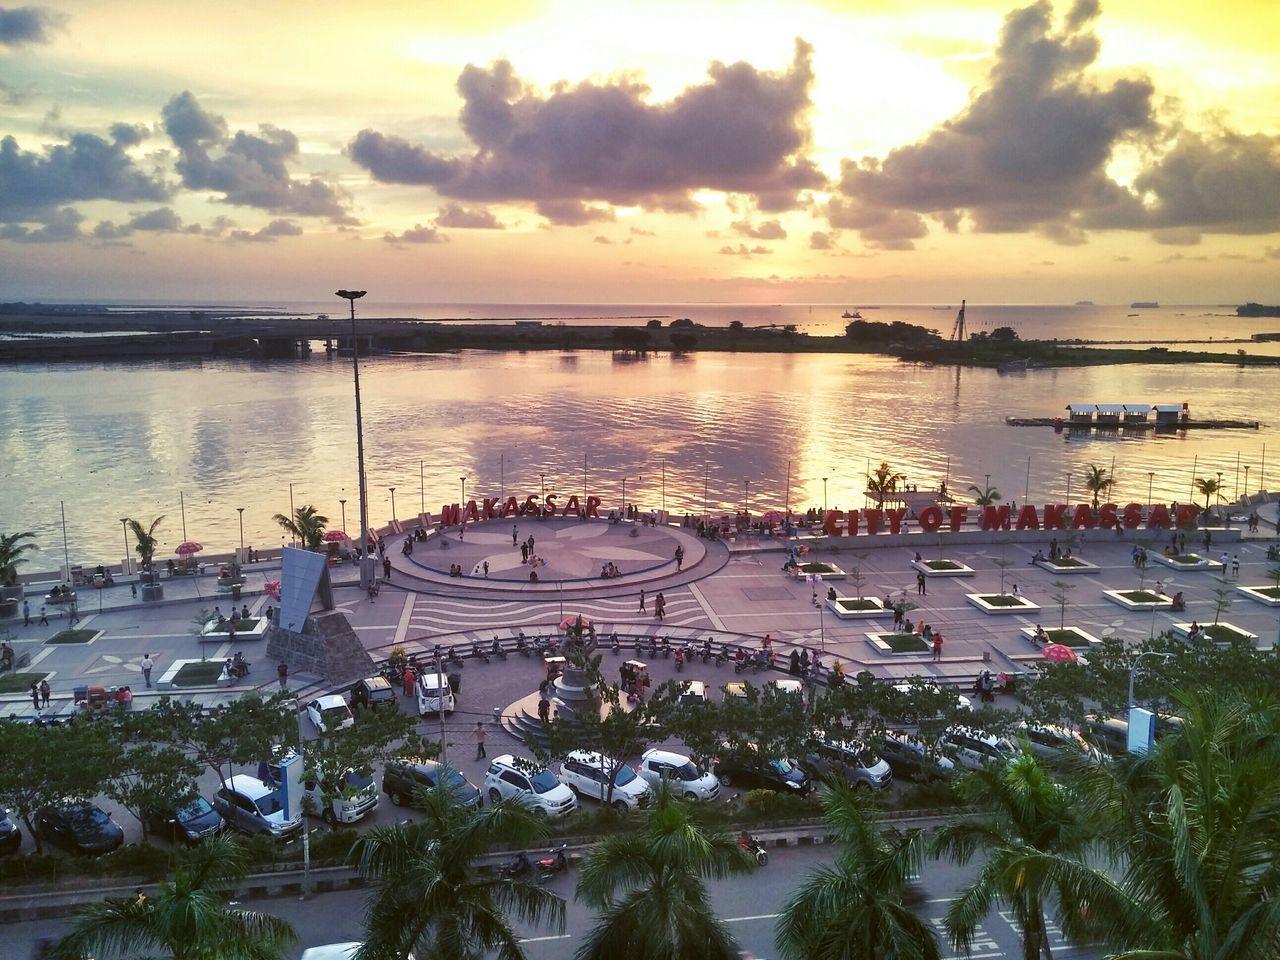 Sunset at Losari Beach, Landscape, Urban Landscape, LG G3 Photography, LG G3